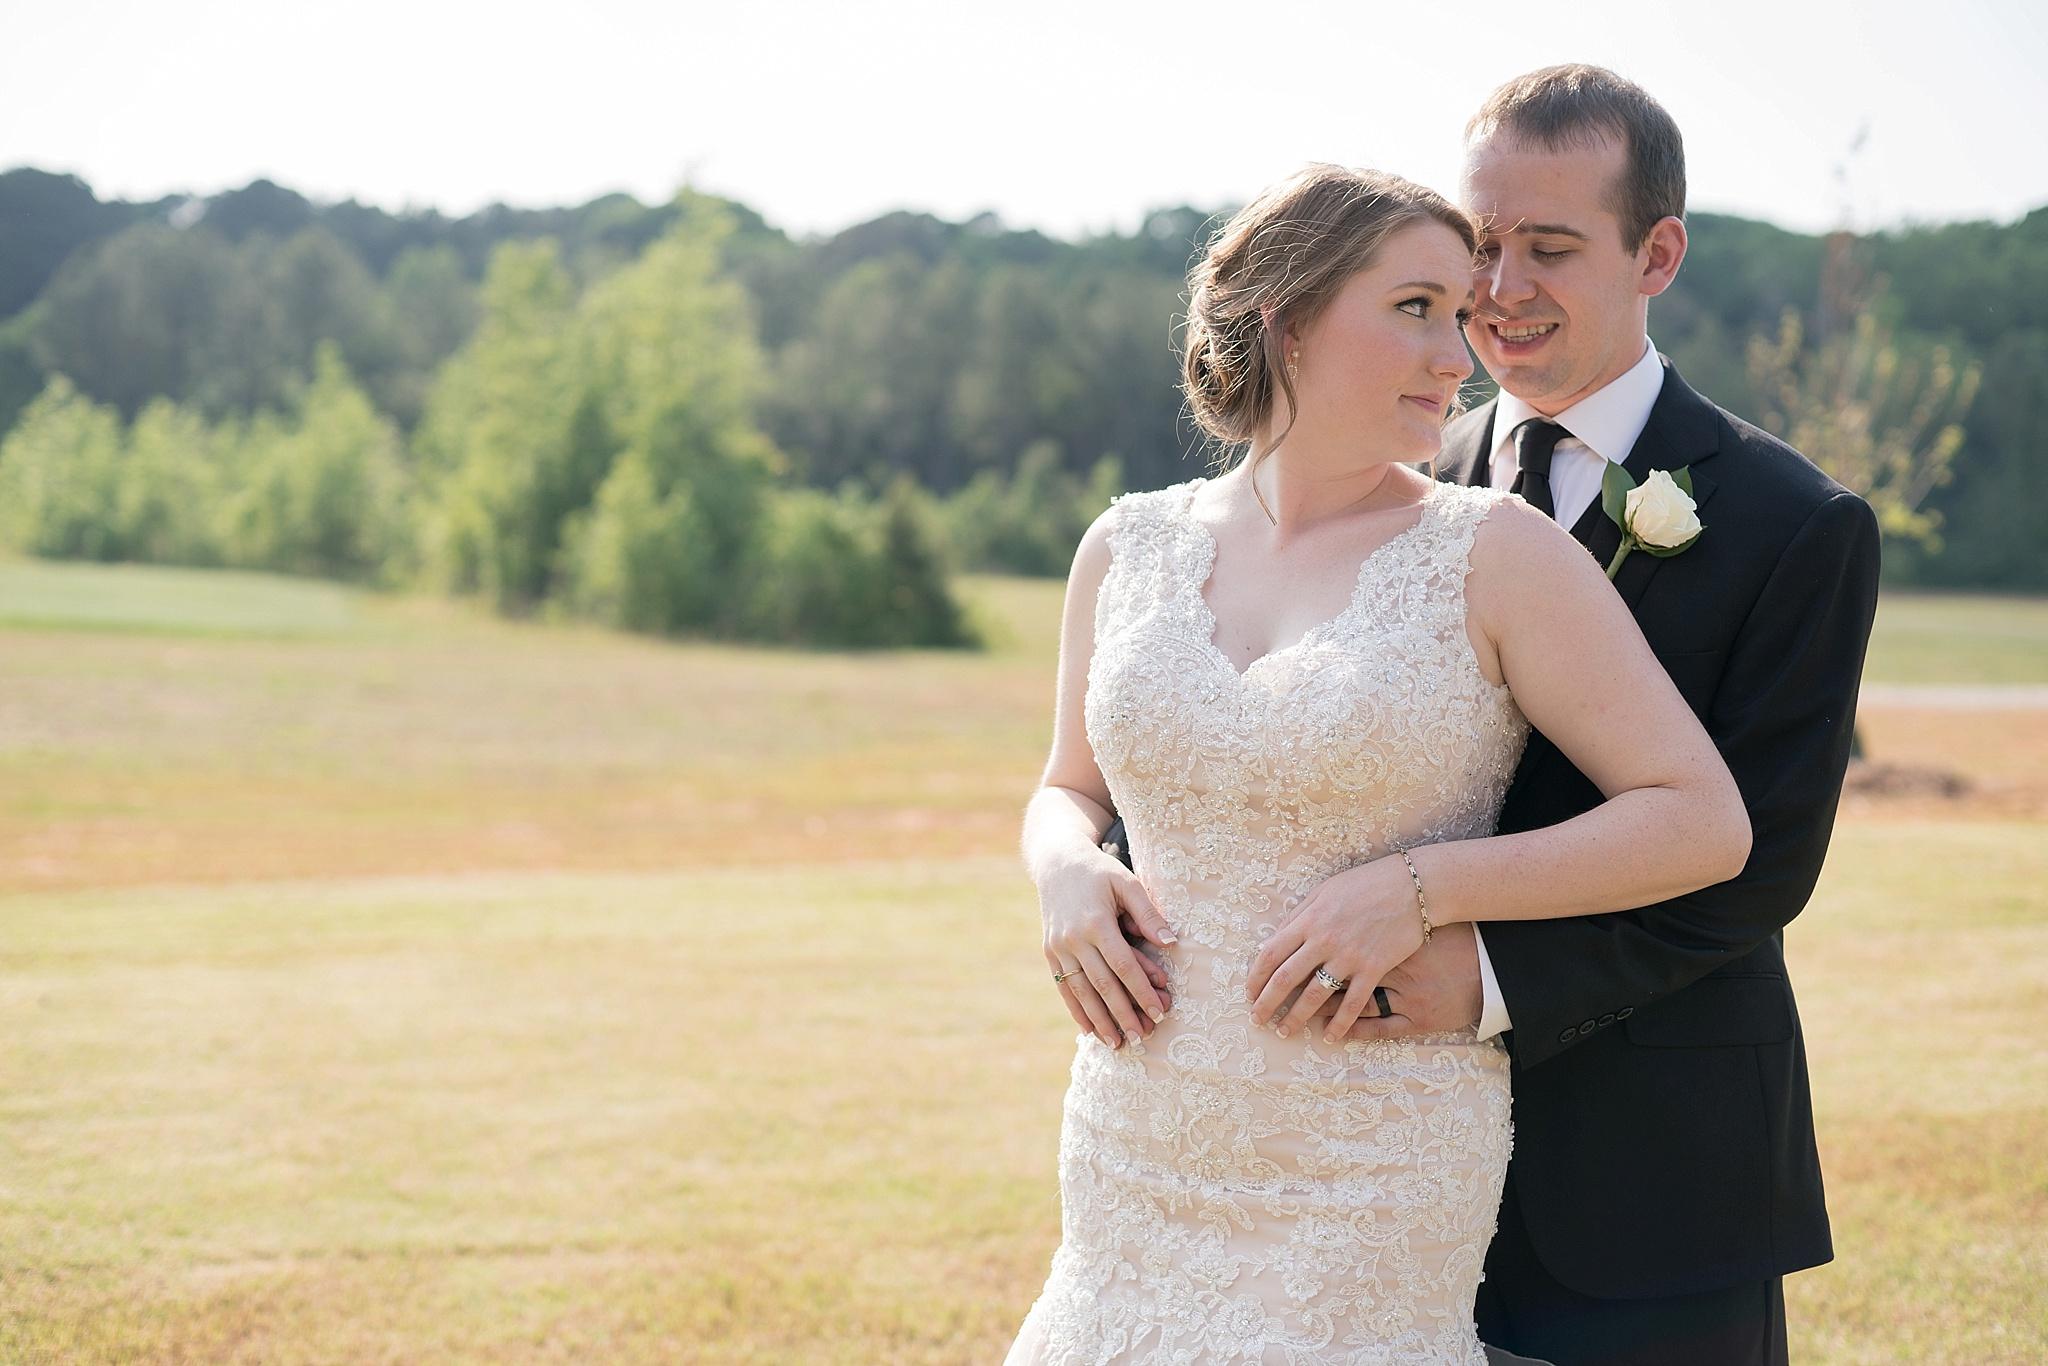 Pavilion-Carriage-Farms-Wedding-Photographer-197.jpg